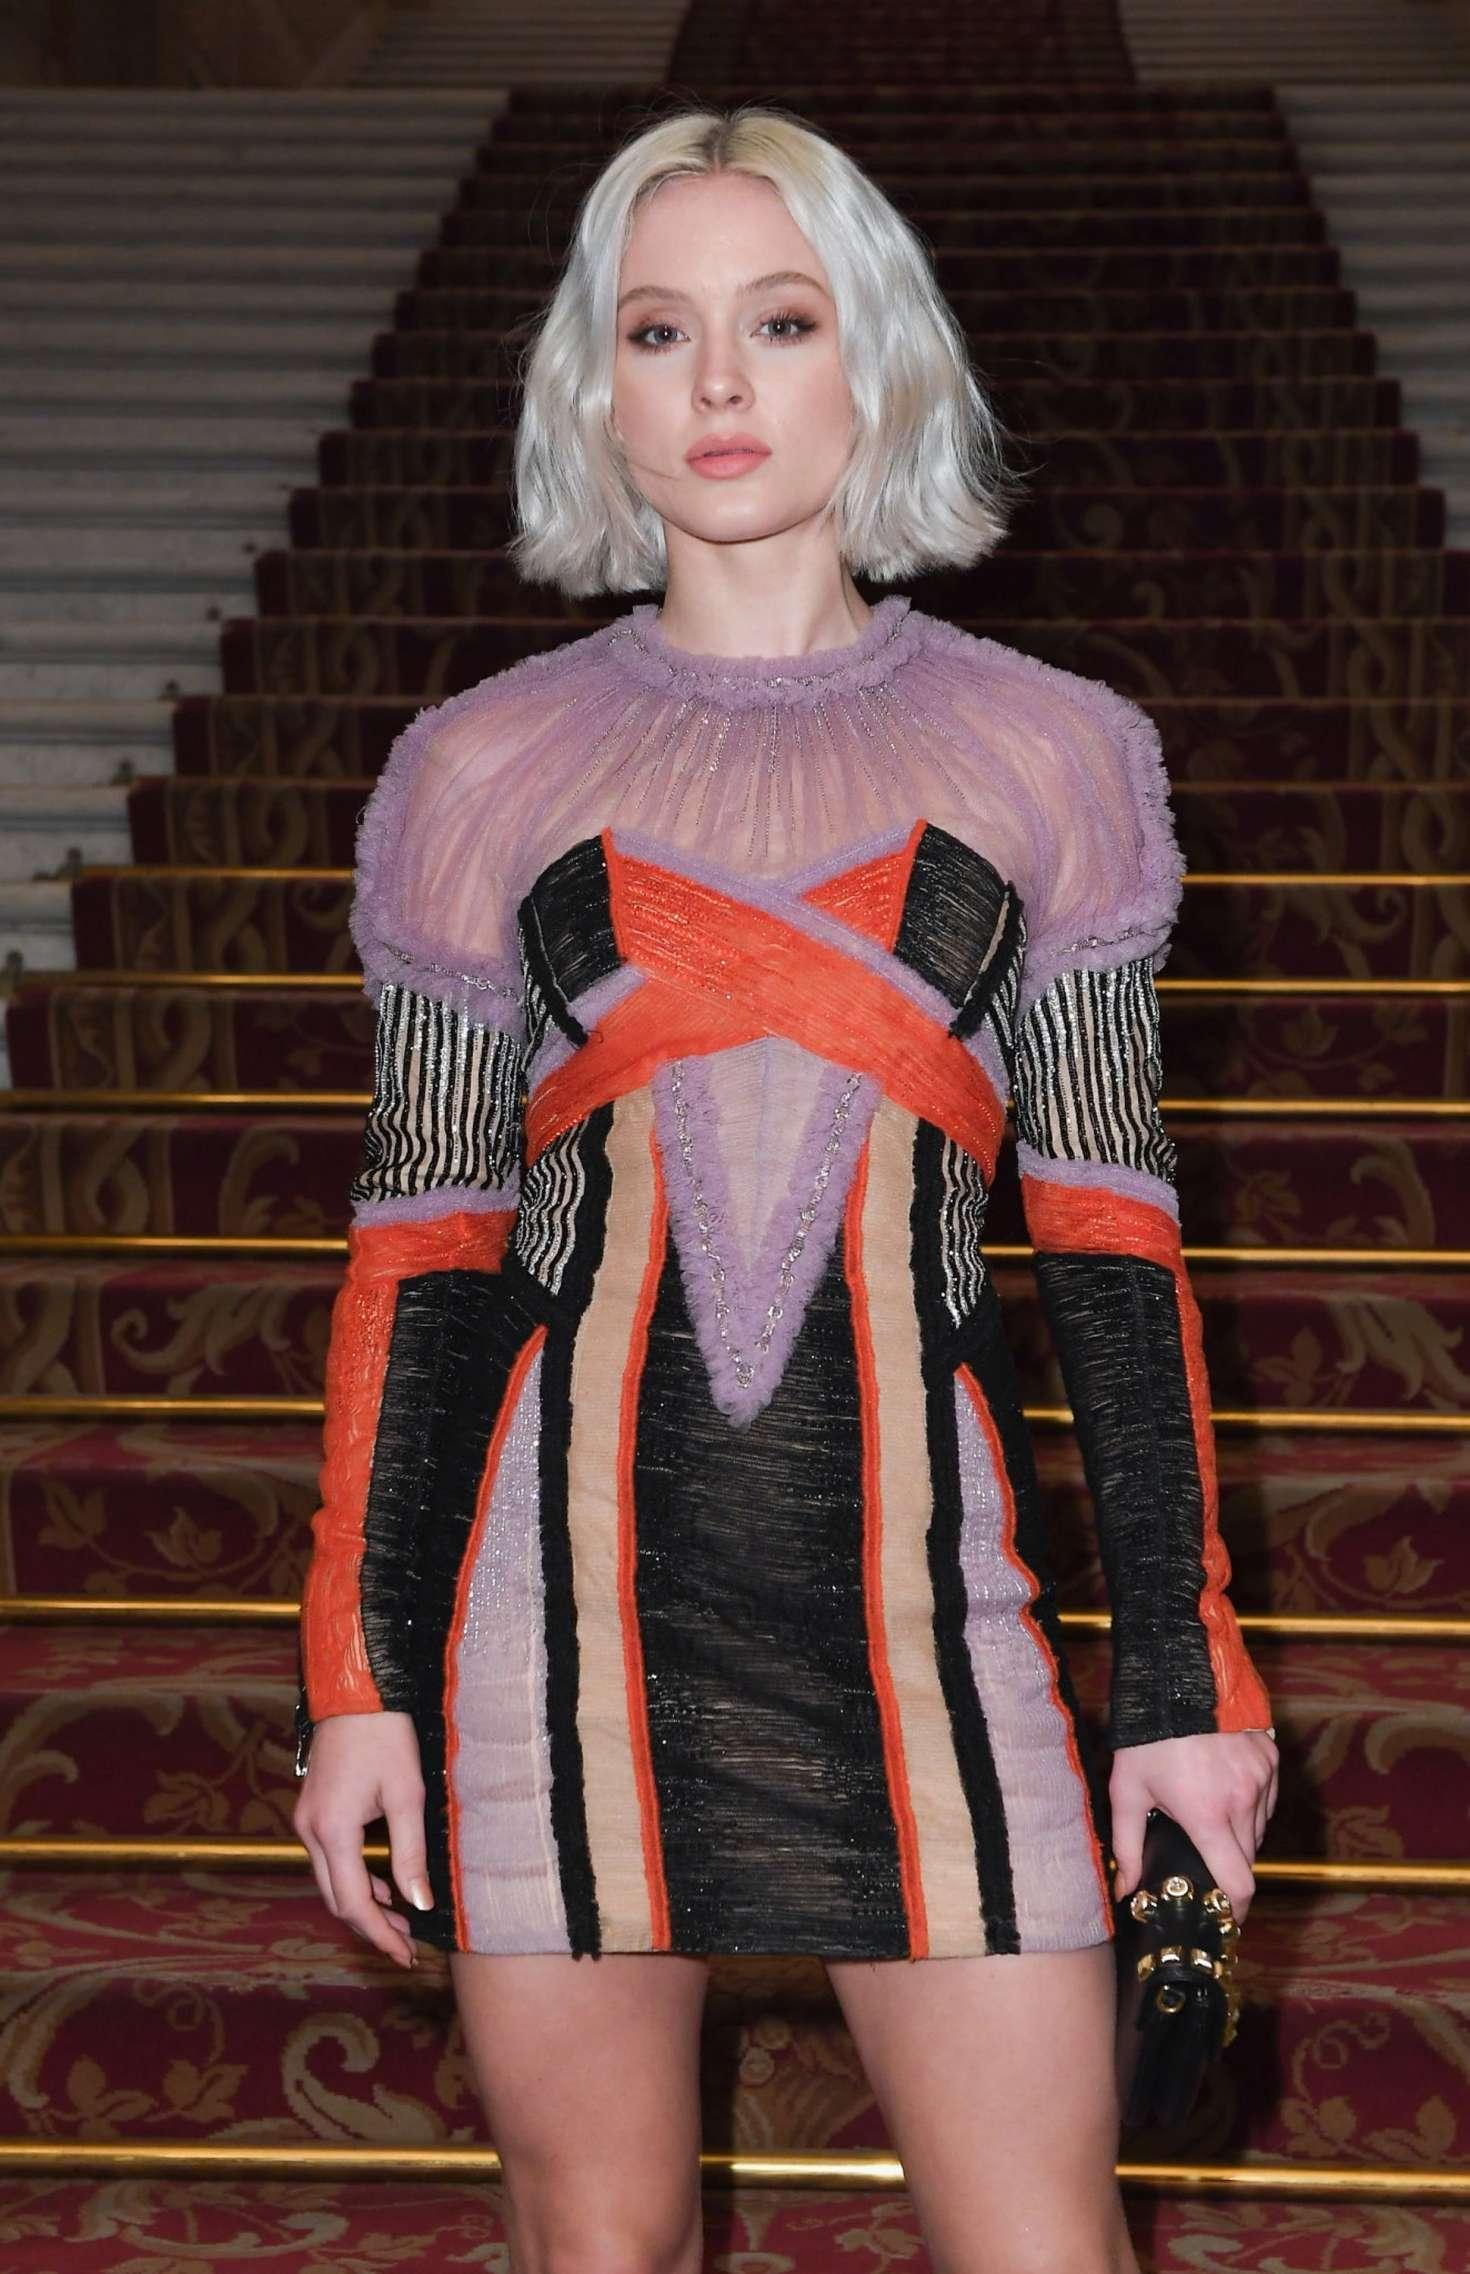 sao quốc tế tại tuần lễ thời trang paris 2019 13